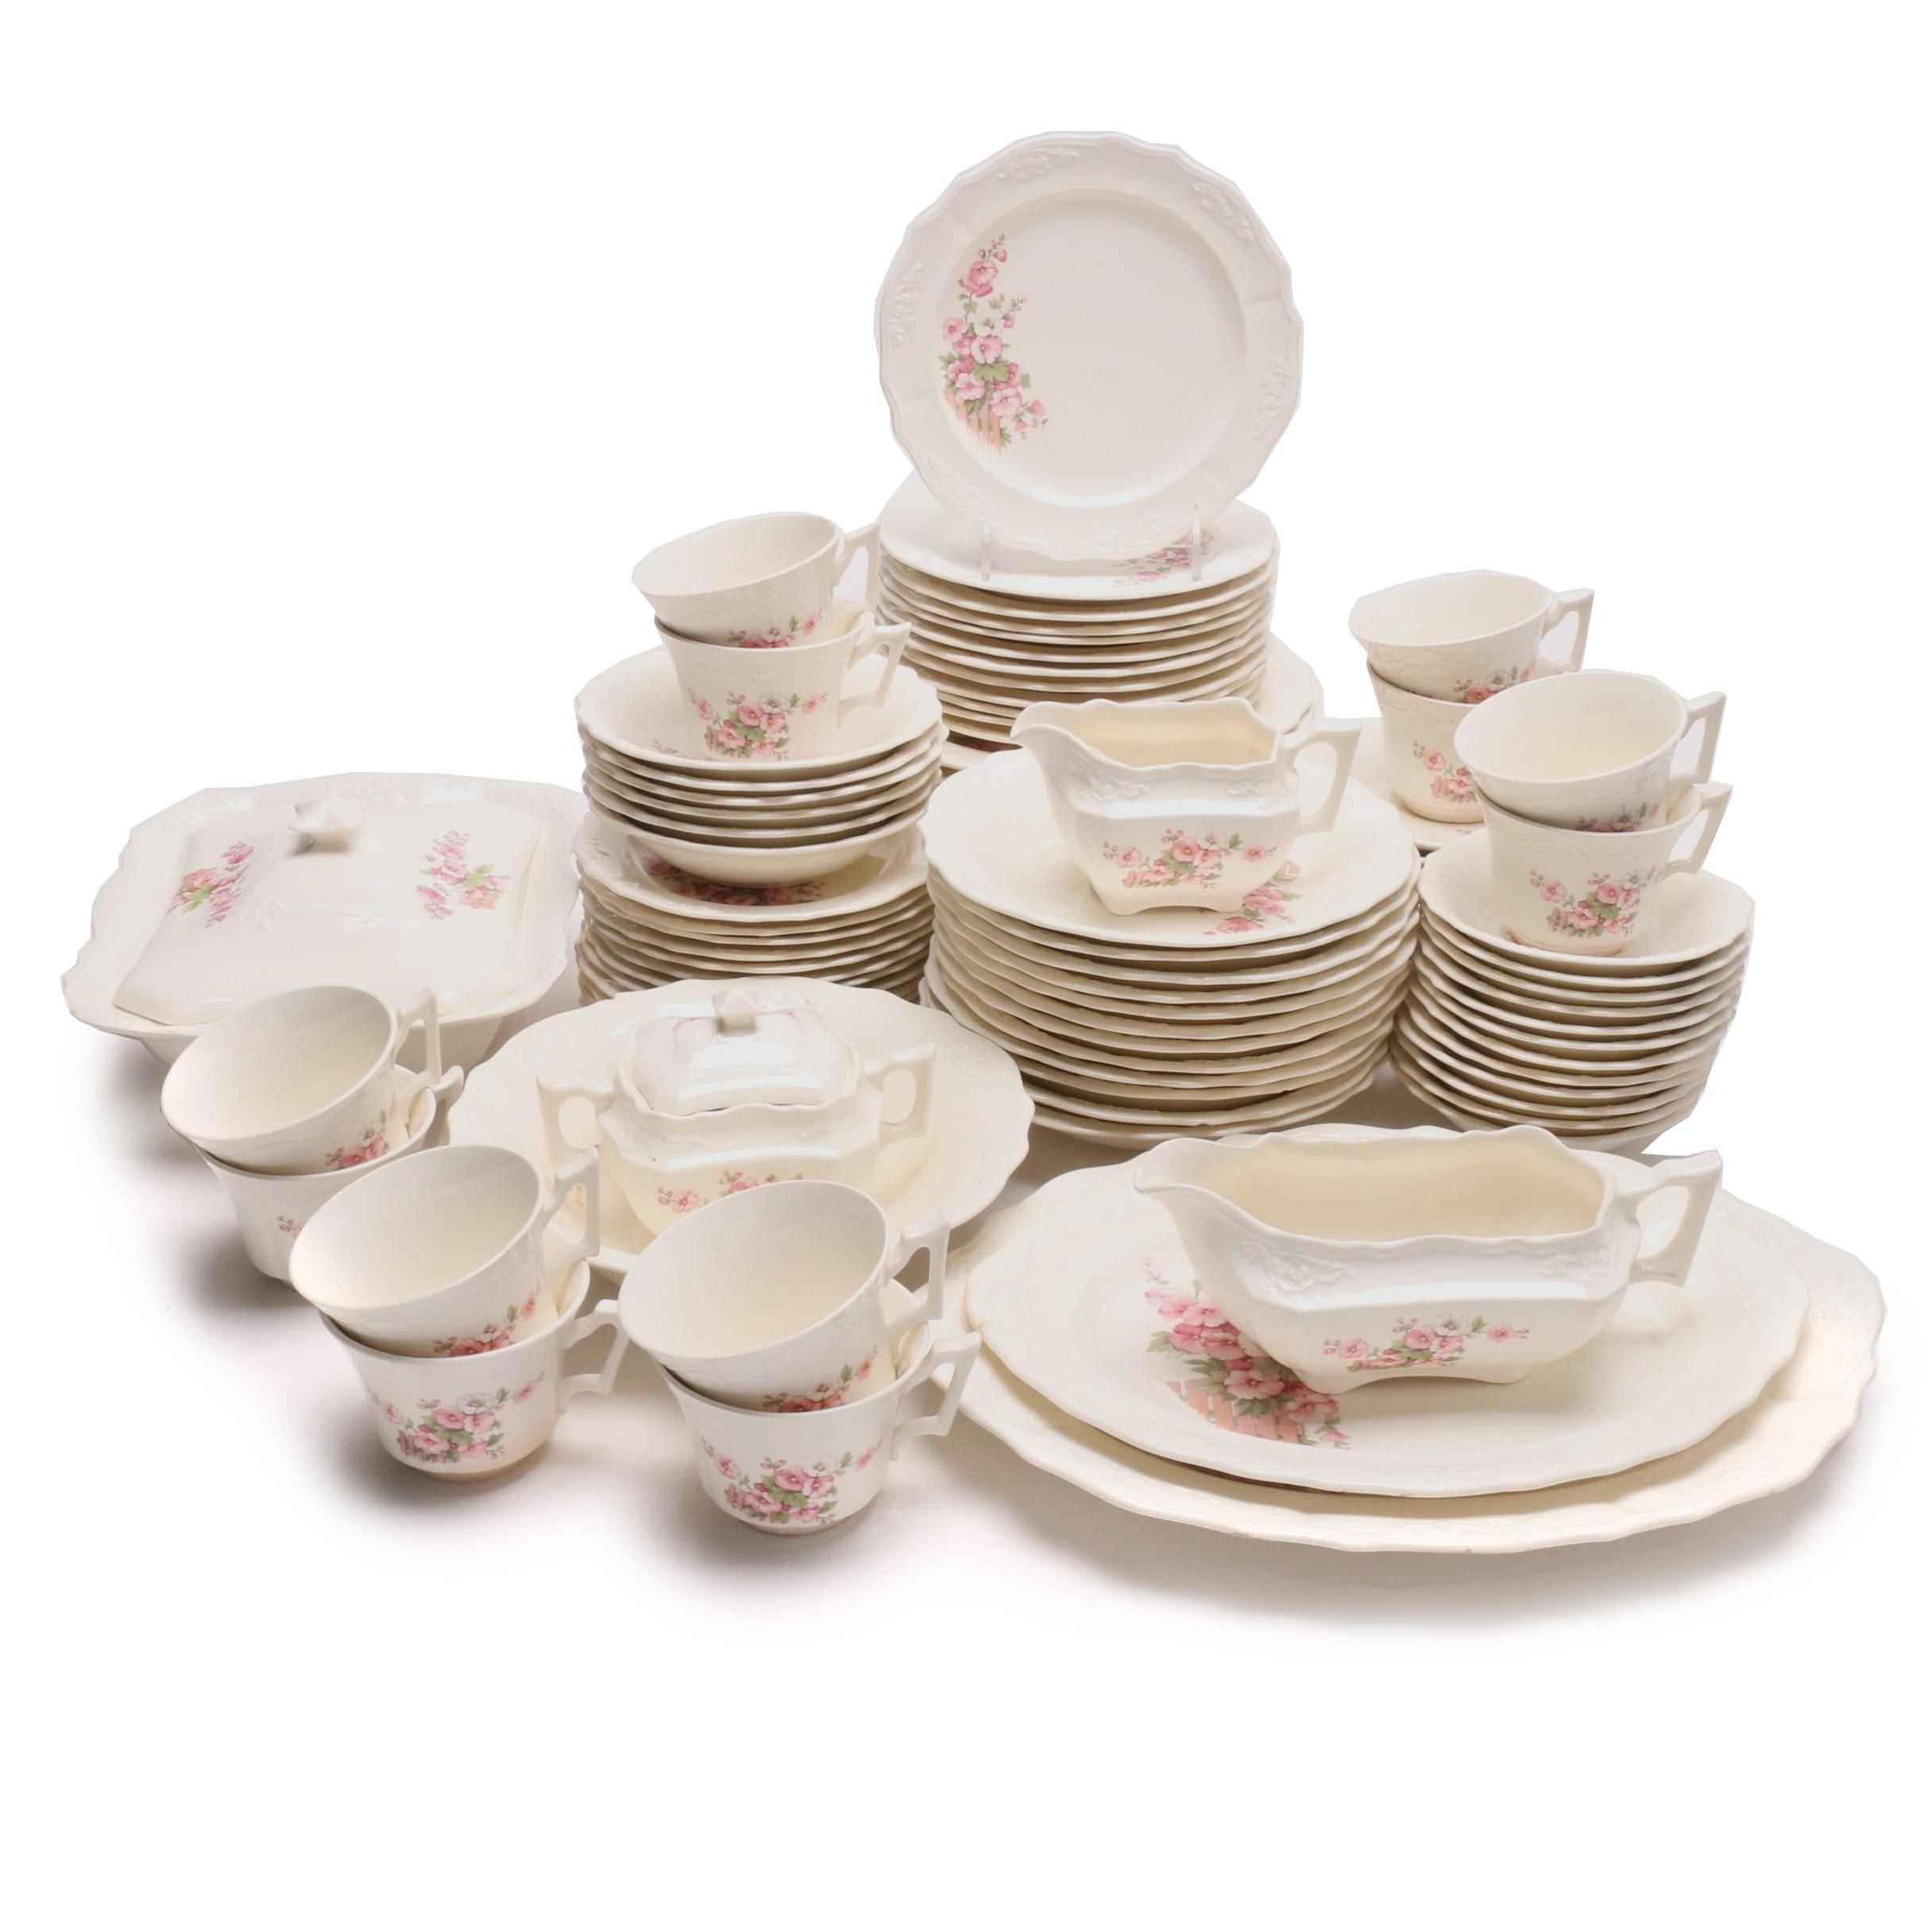 C.C. Thompson Pottery Co. Dinnerware Service for Twelve